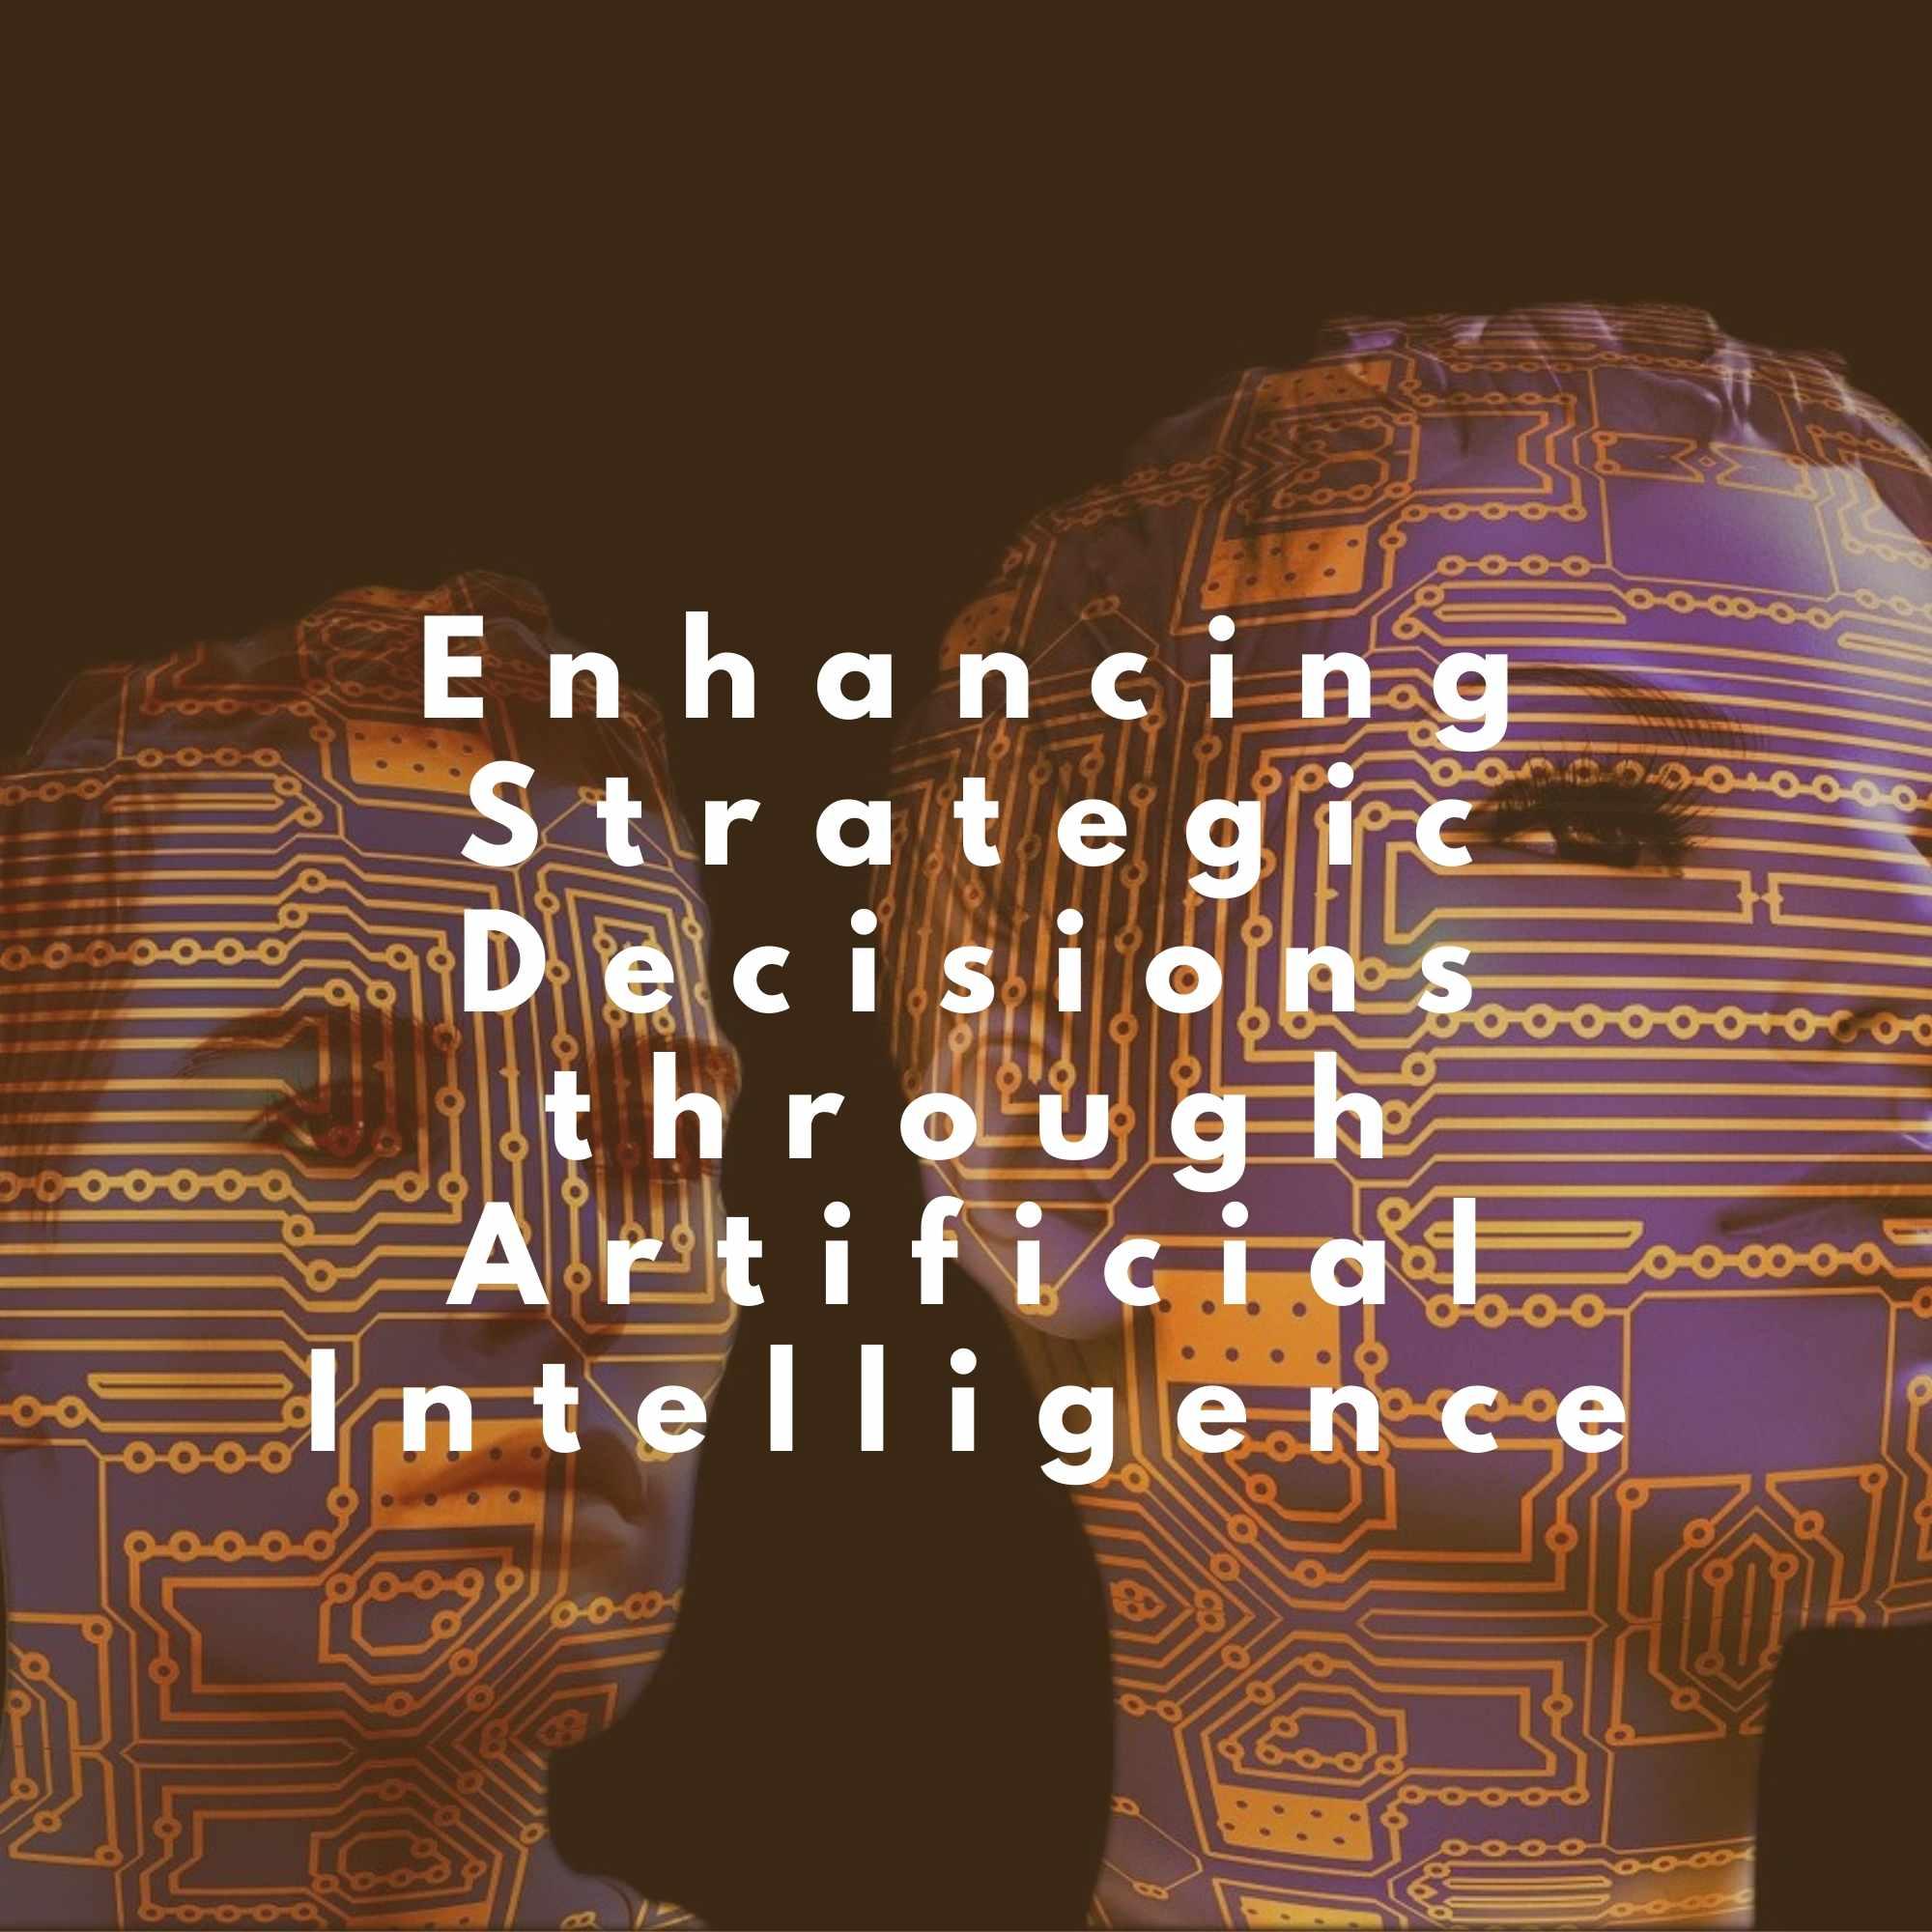 Enhancing Strategic Decisions through Artificial Intelligence